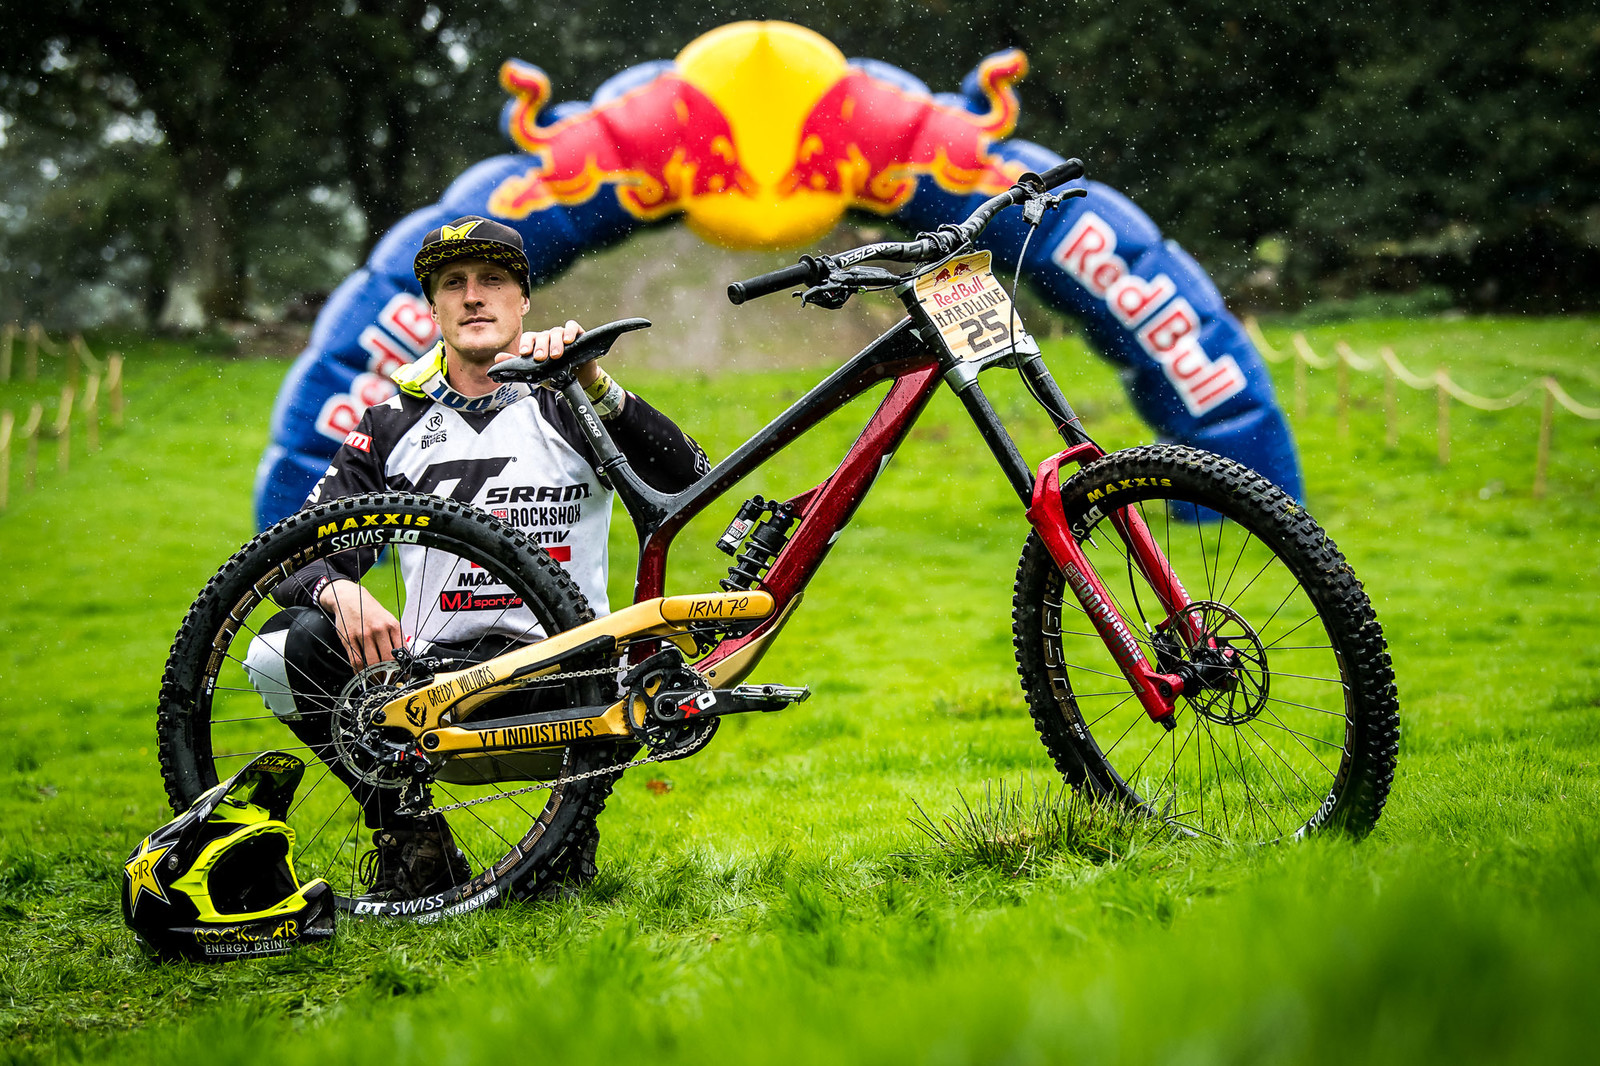 Erik Irmisch and his YT Tues Worlds Bike - Red Bull Hardline 2018 Riders and Bikes - Mountain Biking Pictures - Vital MTB